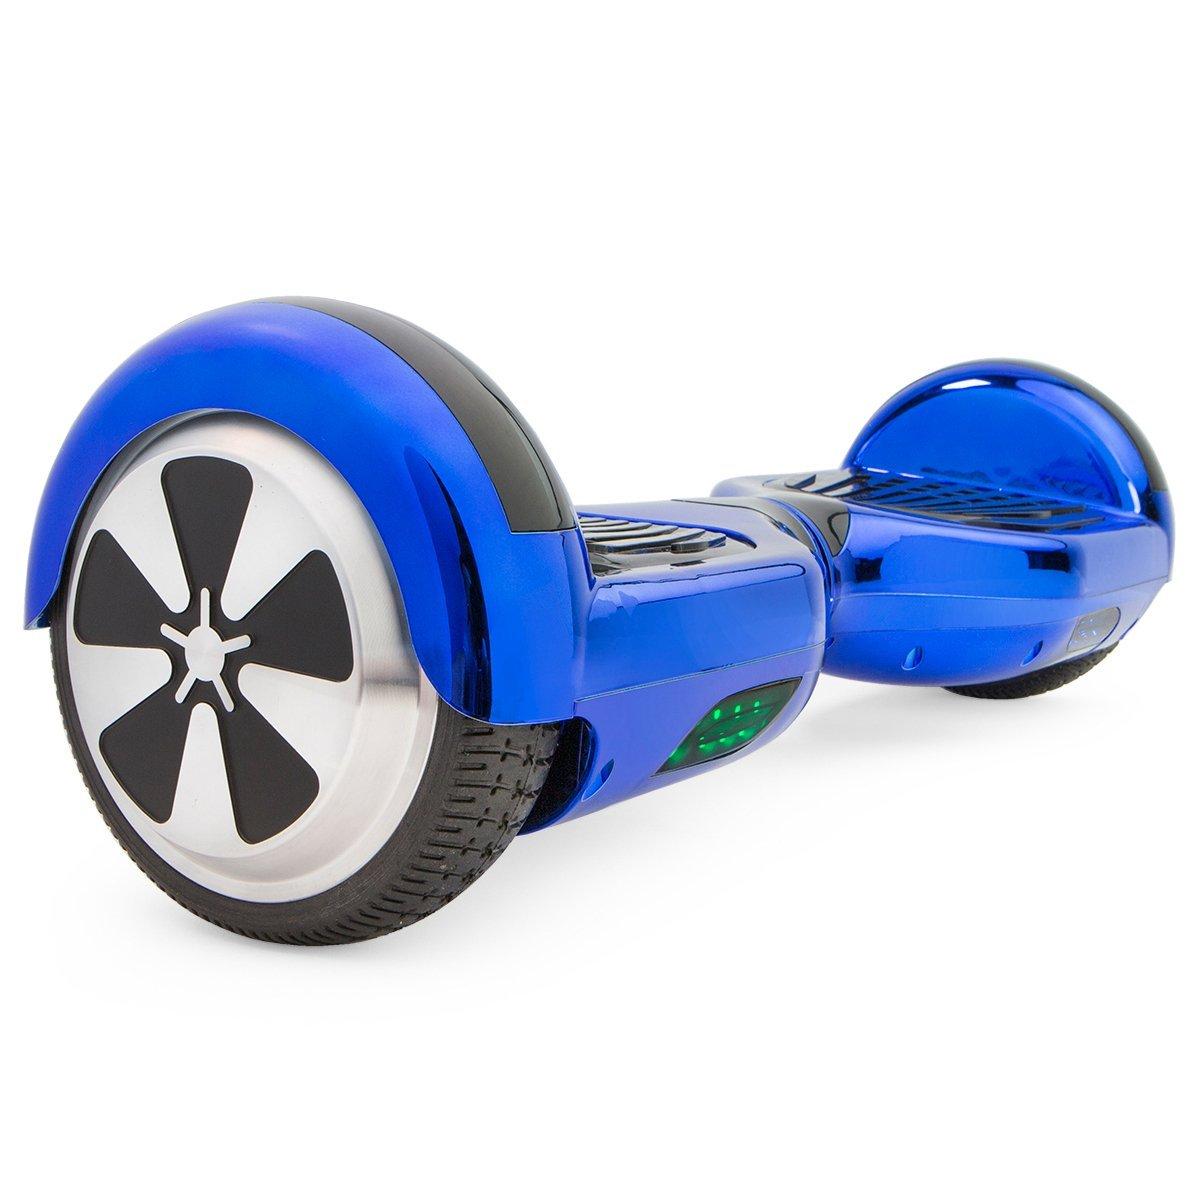 Top 6 Best Self Balancing Scooters